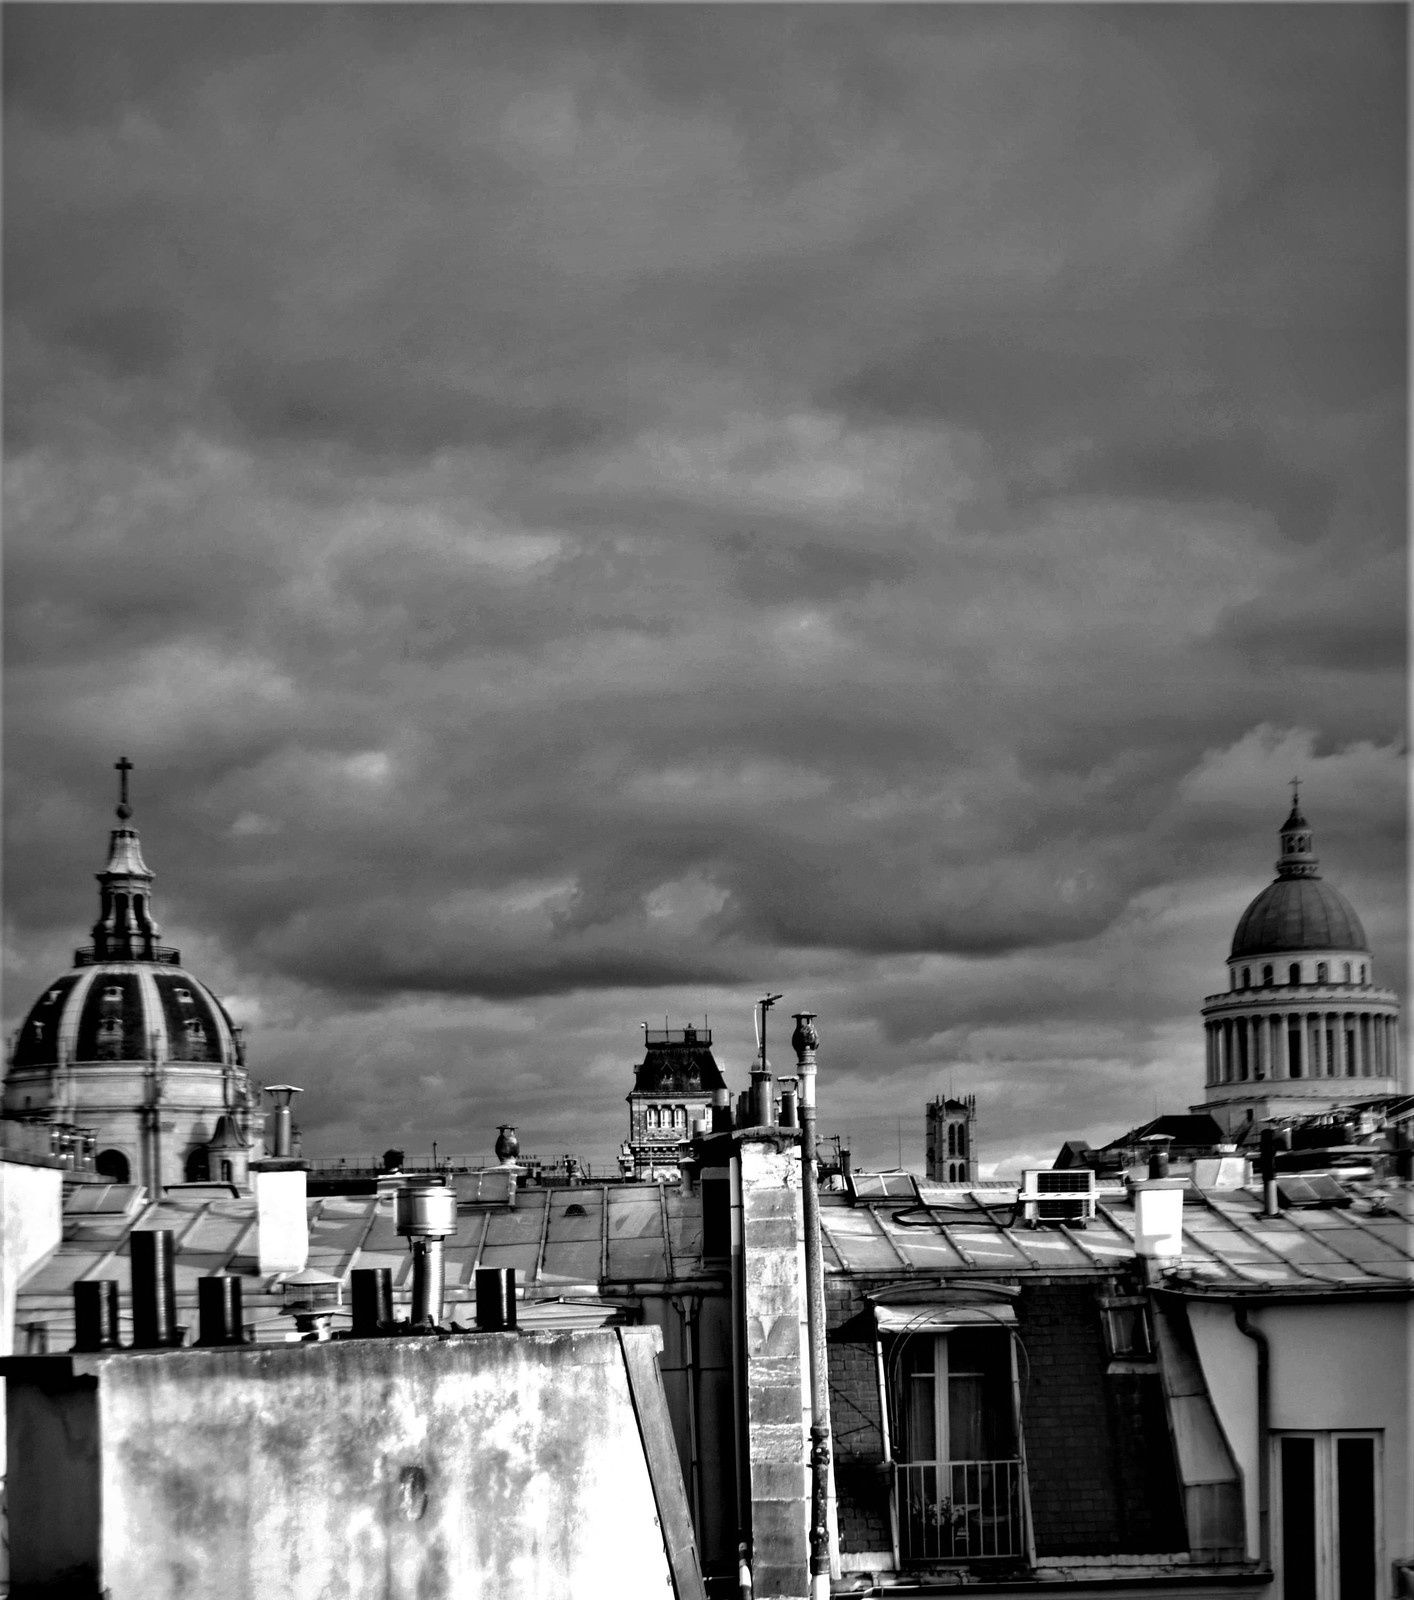 SAMEDI A PARIS ! MES PHOTOS AVEC MON NOUVEAU REFLEX !!! URBAN CLIMBING (MODE ASCENSEUR) !!